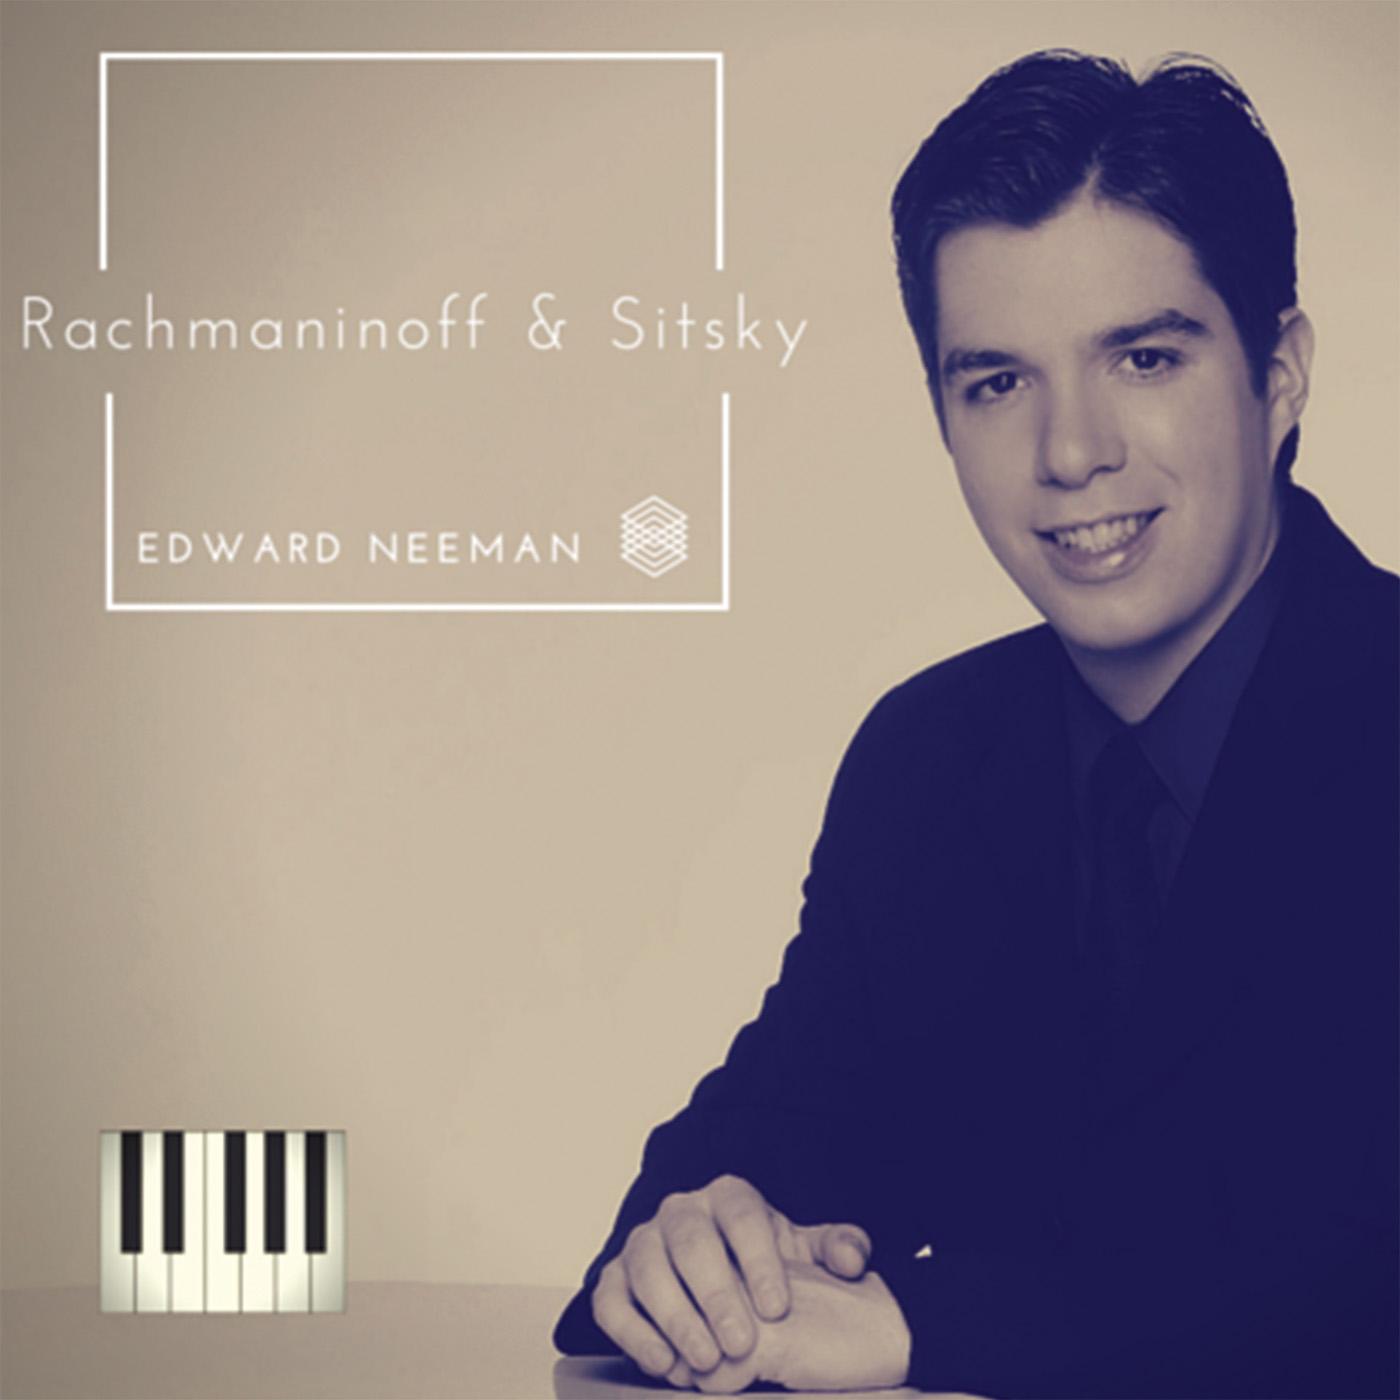 rachmaninoffsitsky.jpeg